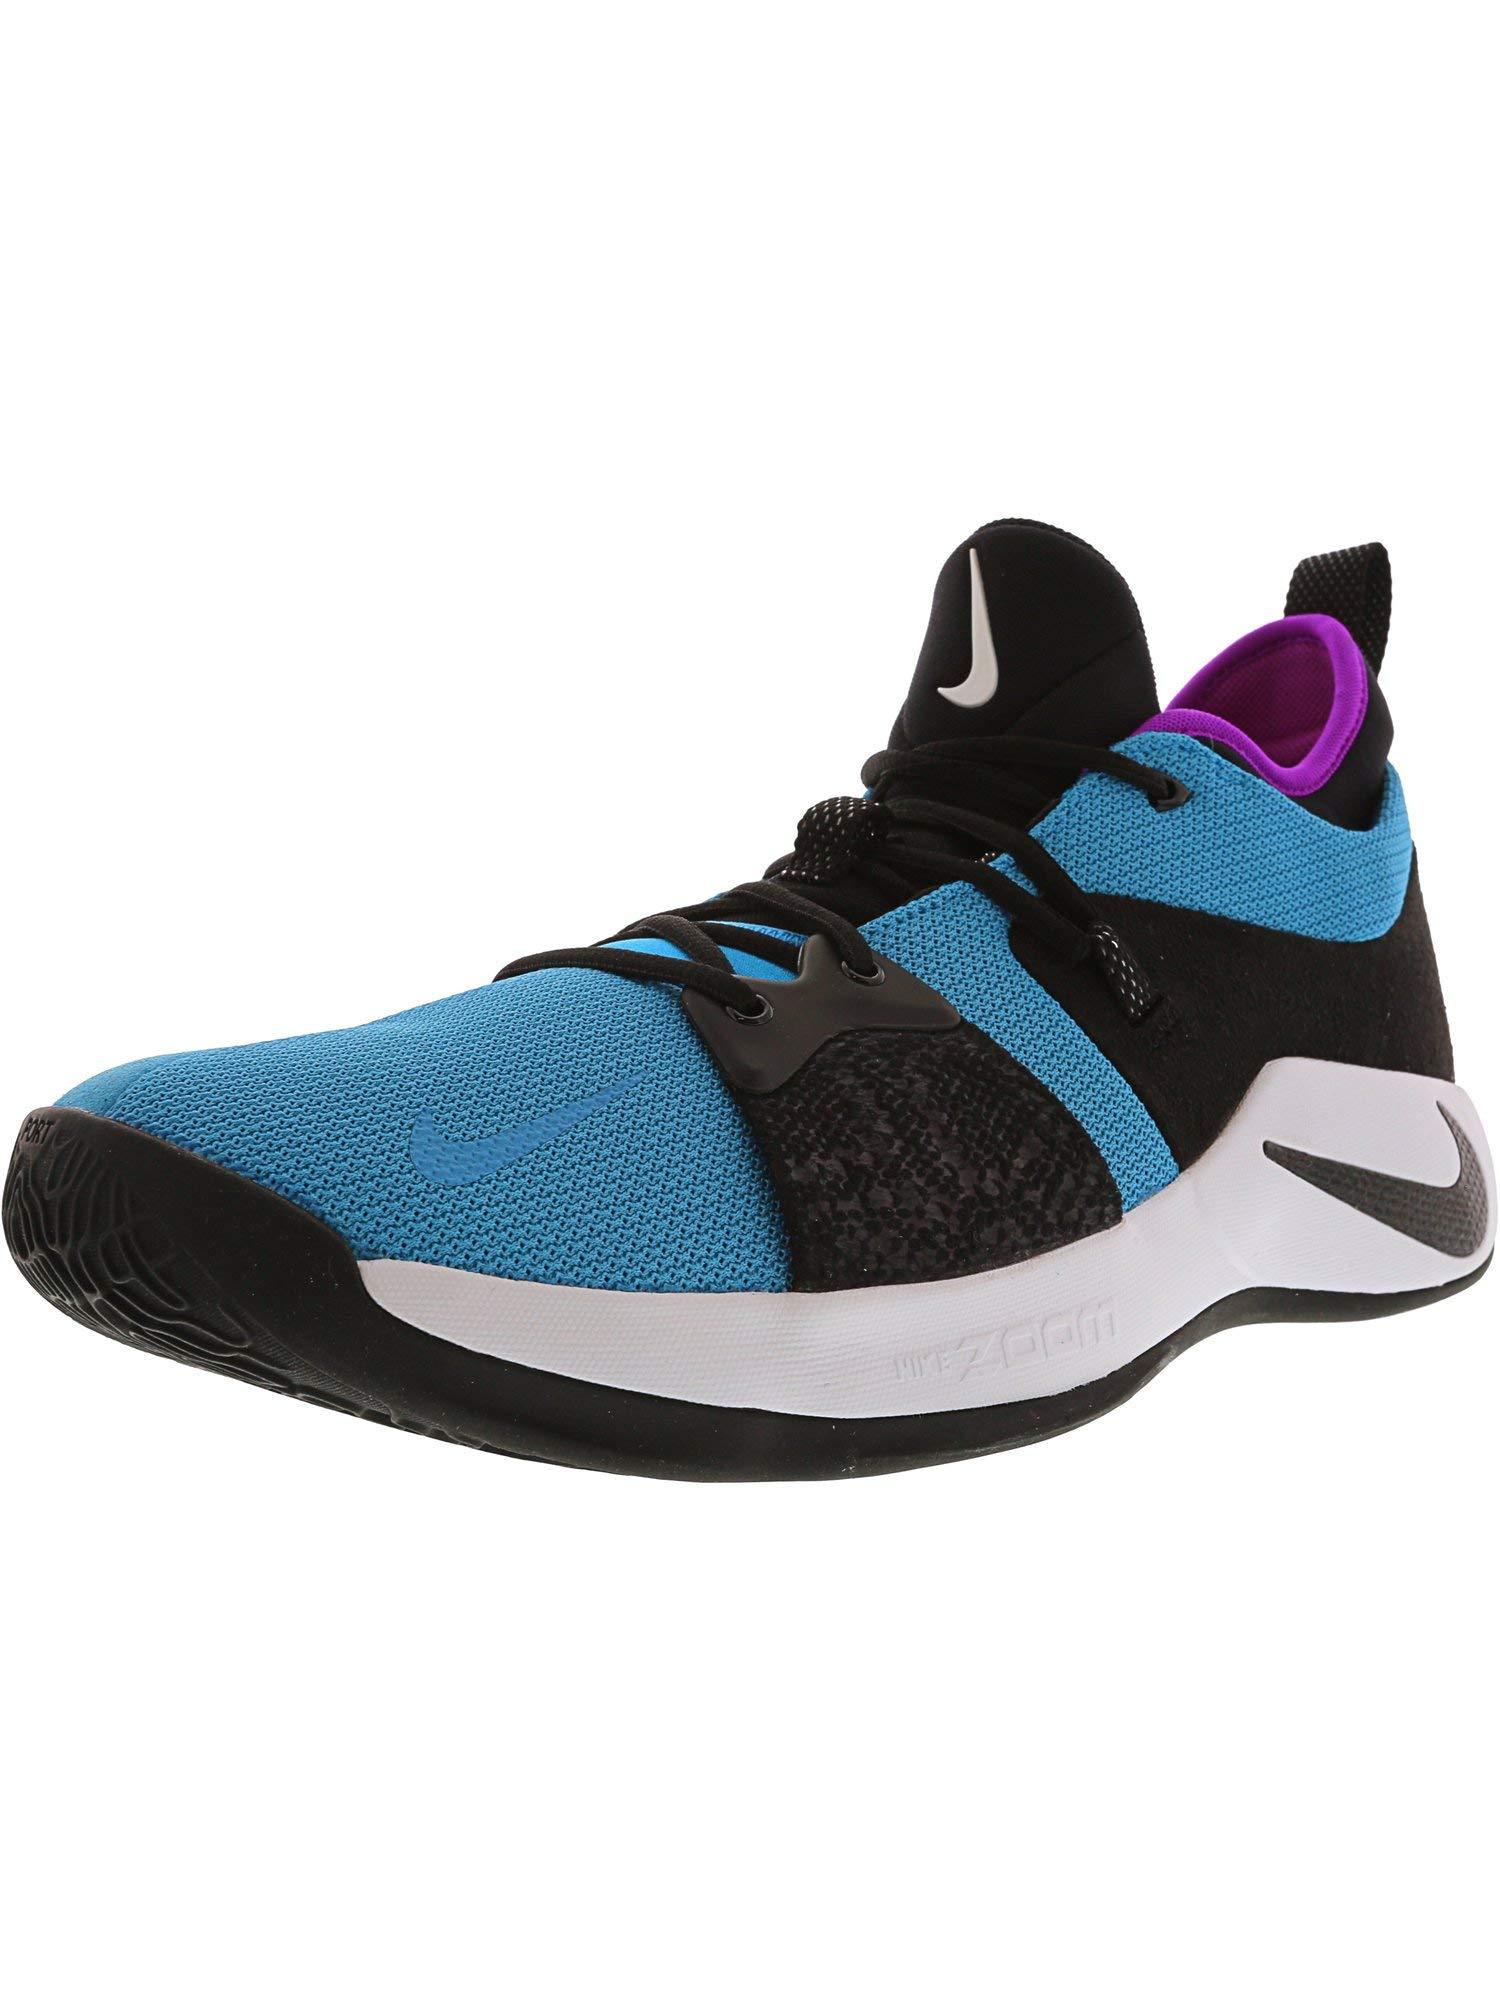 Nike Men s Pg 2 Blue Lagoon Black - Hyper Violet Ankle-High Running Shoe 14M 6fc5b89cc